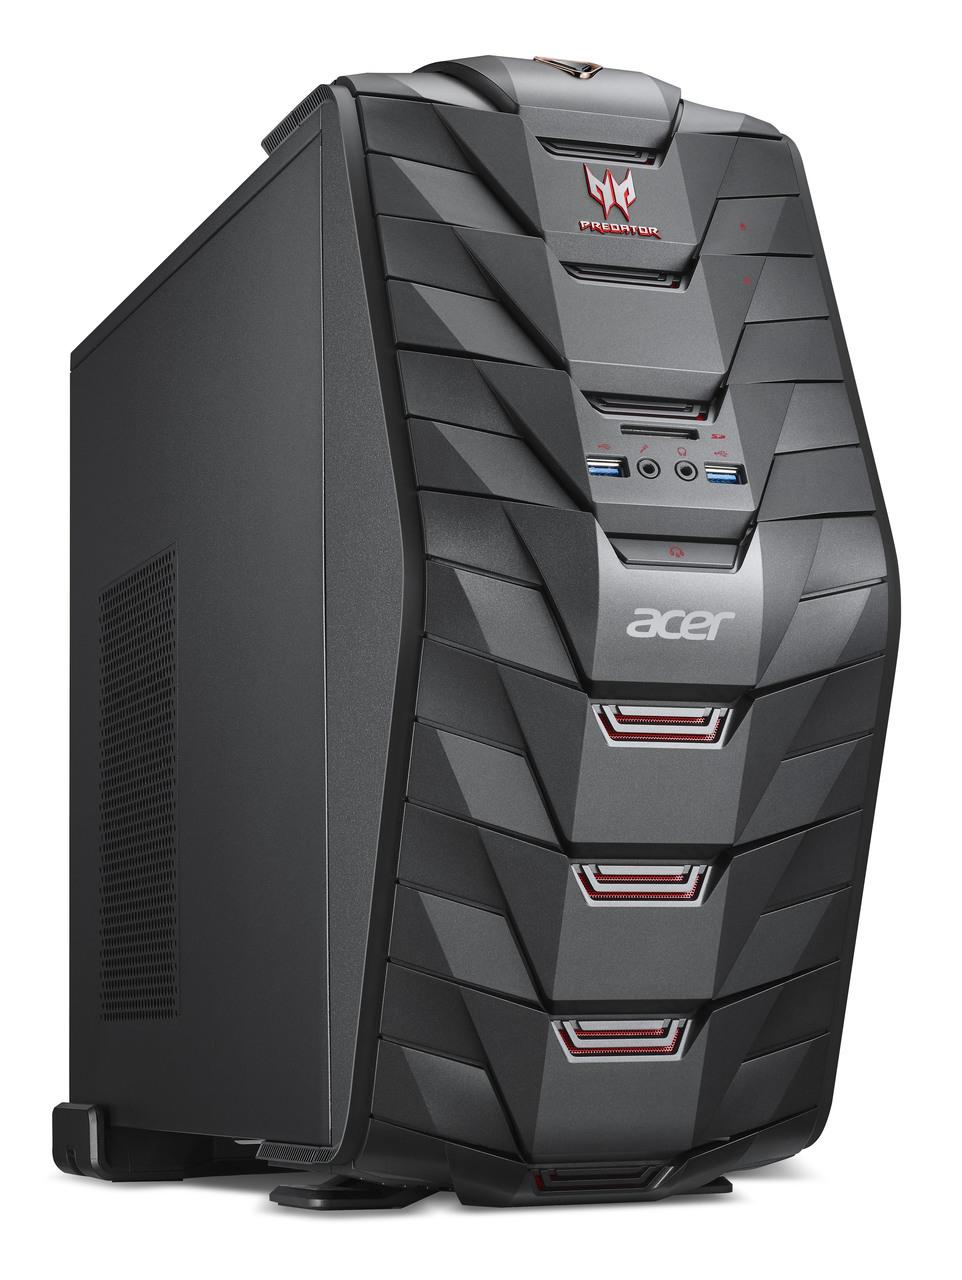 Acer Predator G3-710 Gaming PC (Scratch and Dent) - i7-7700    GTX 1070 8 GB   32 GB Ram   1 TB HDD + 256 GB SSD   Win 10 - $899.99 w/FS @ Acerrecertified.com